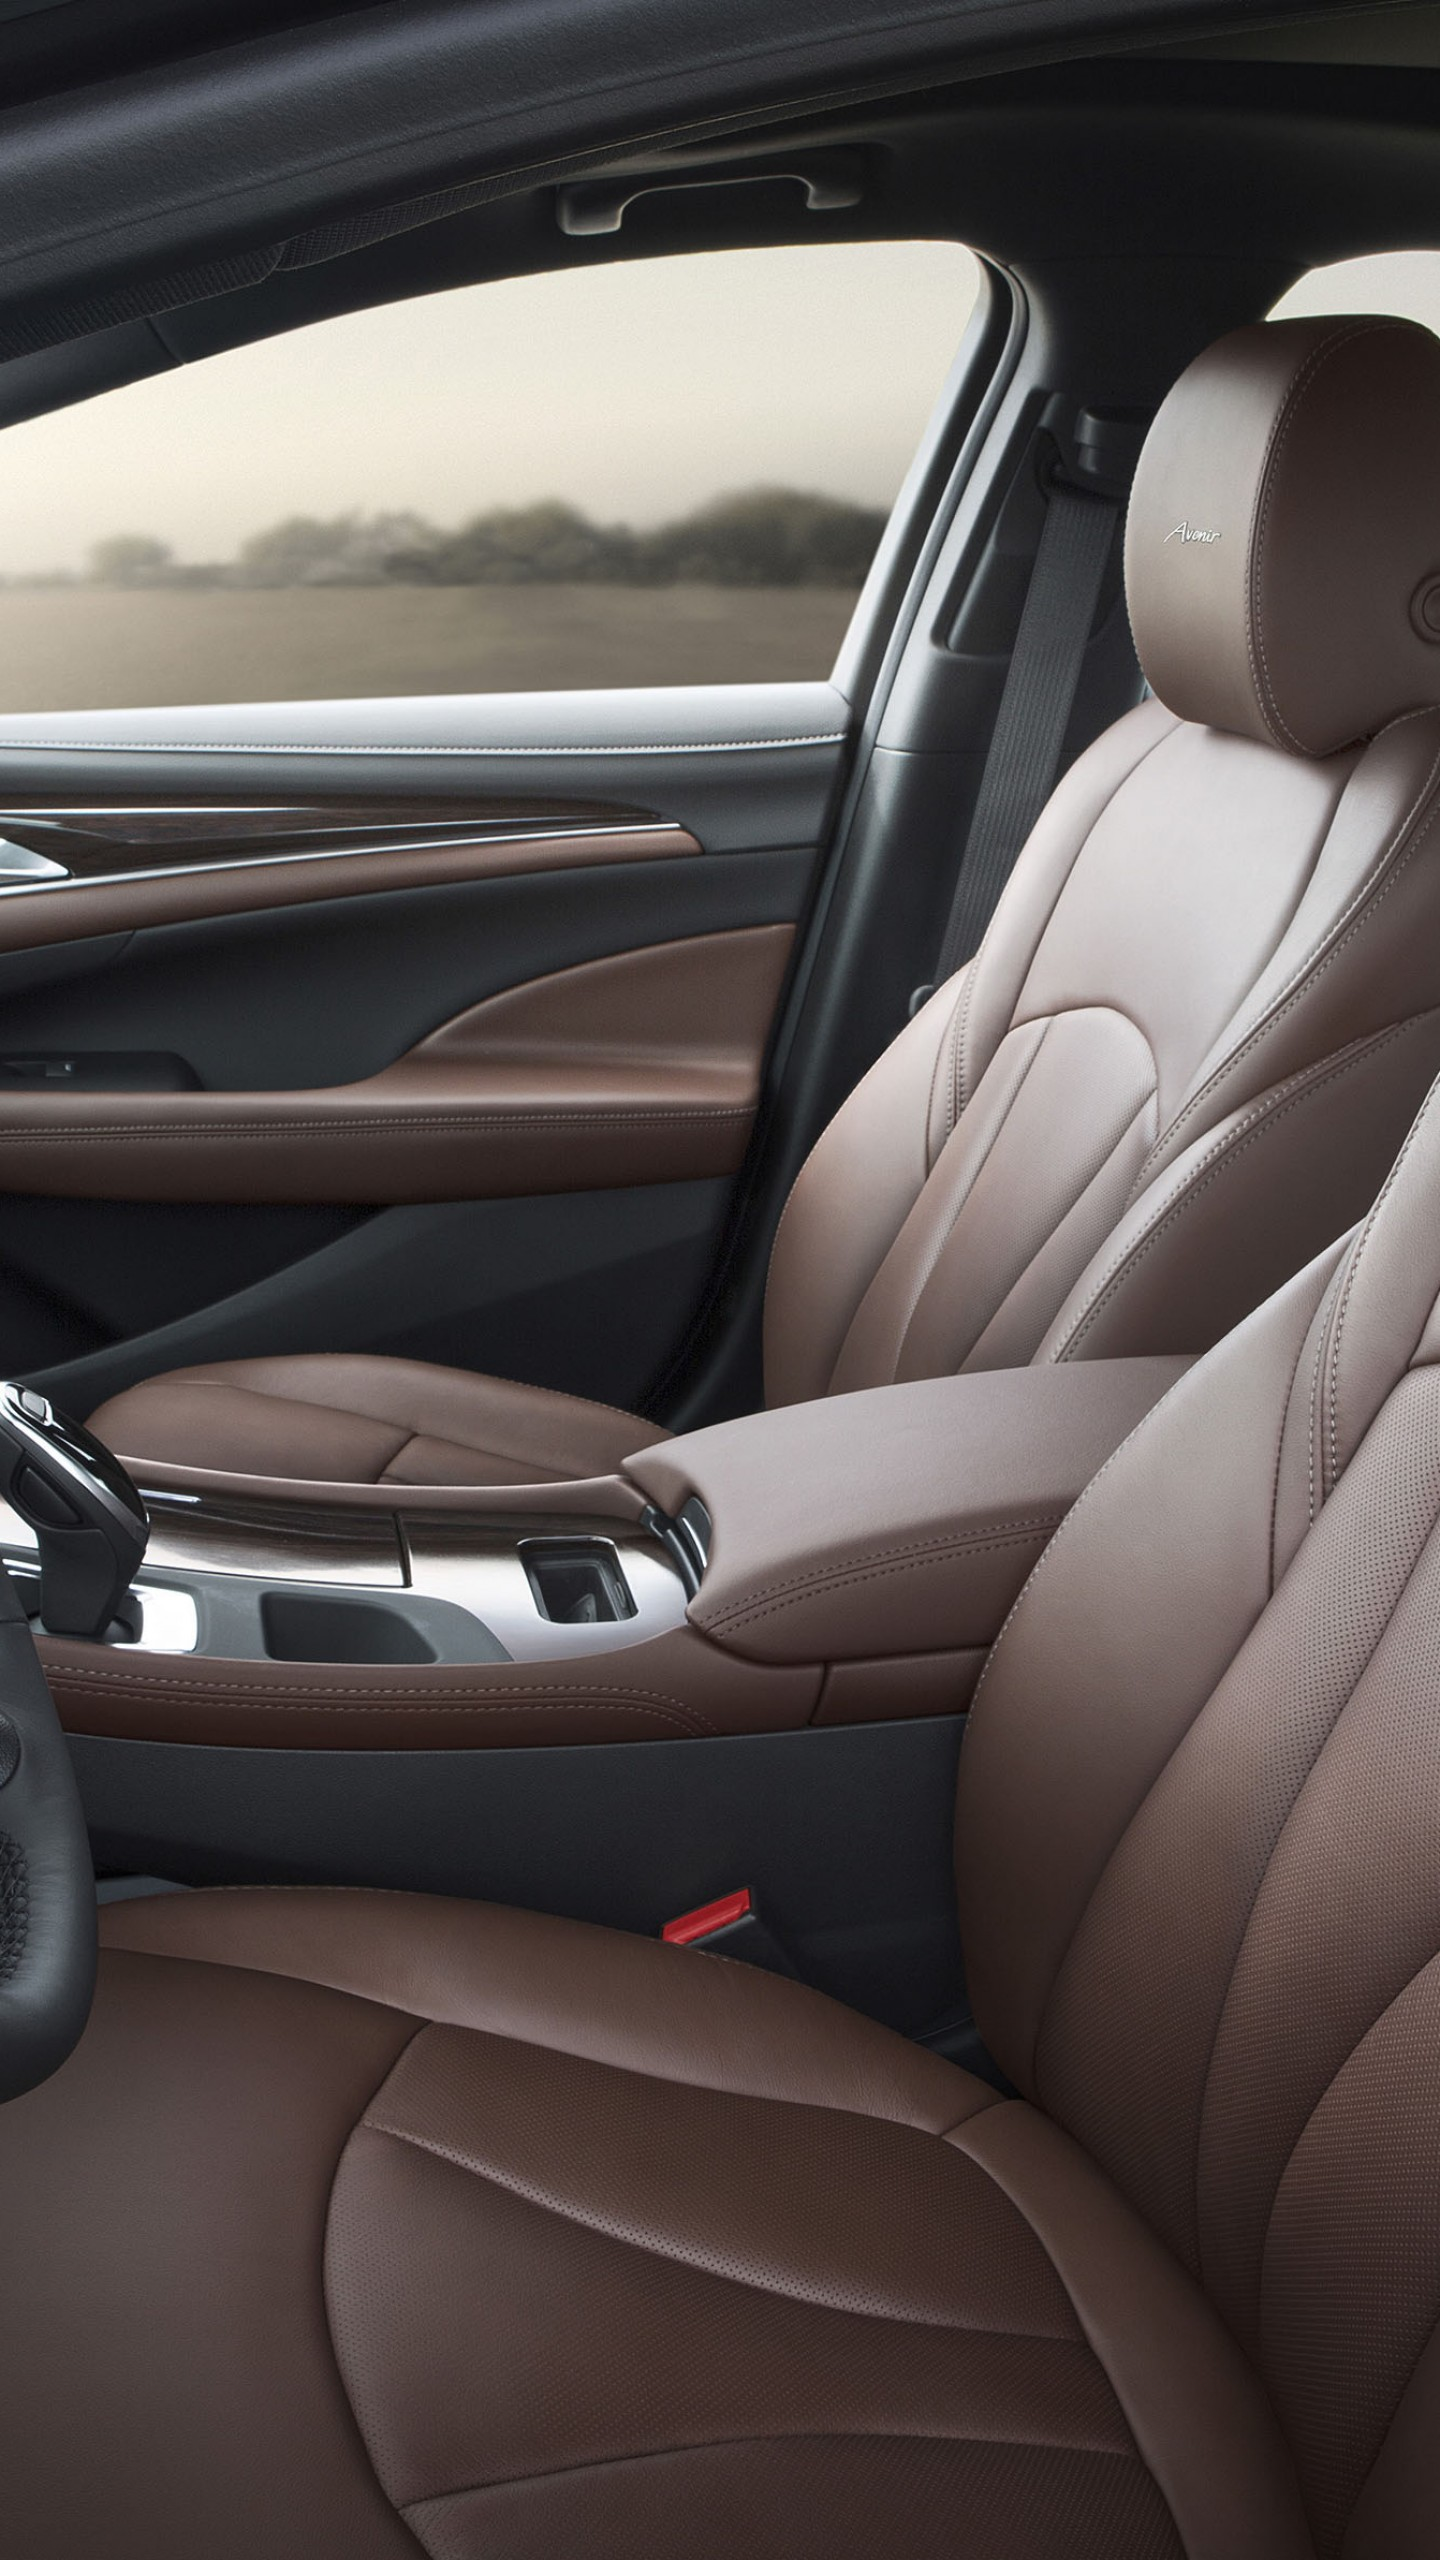 Wallpaper Buick LaCrosse Avenir, interior, 2018 Cars, 4k ...